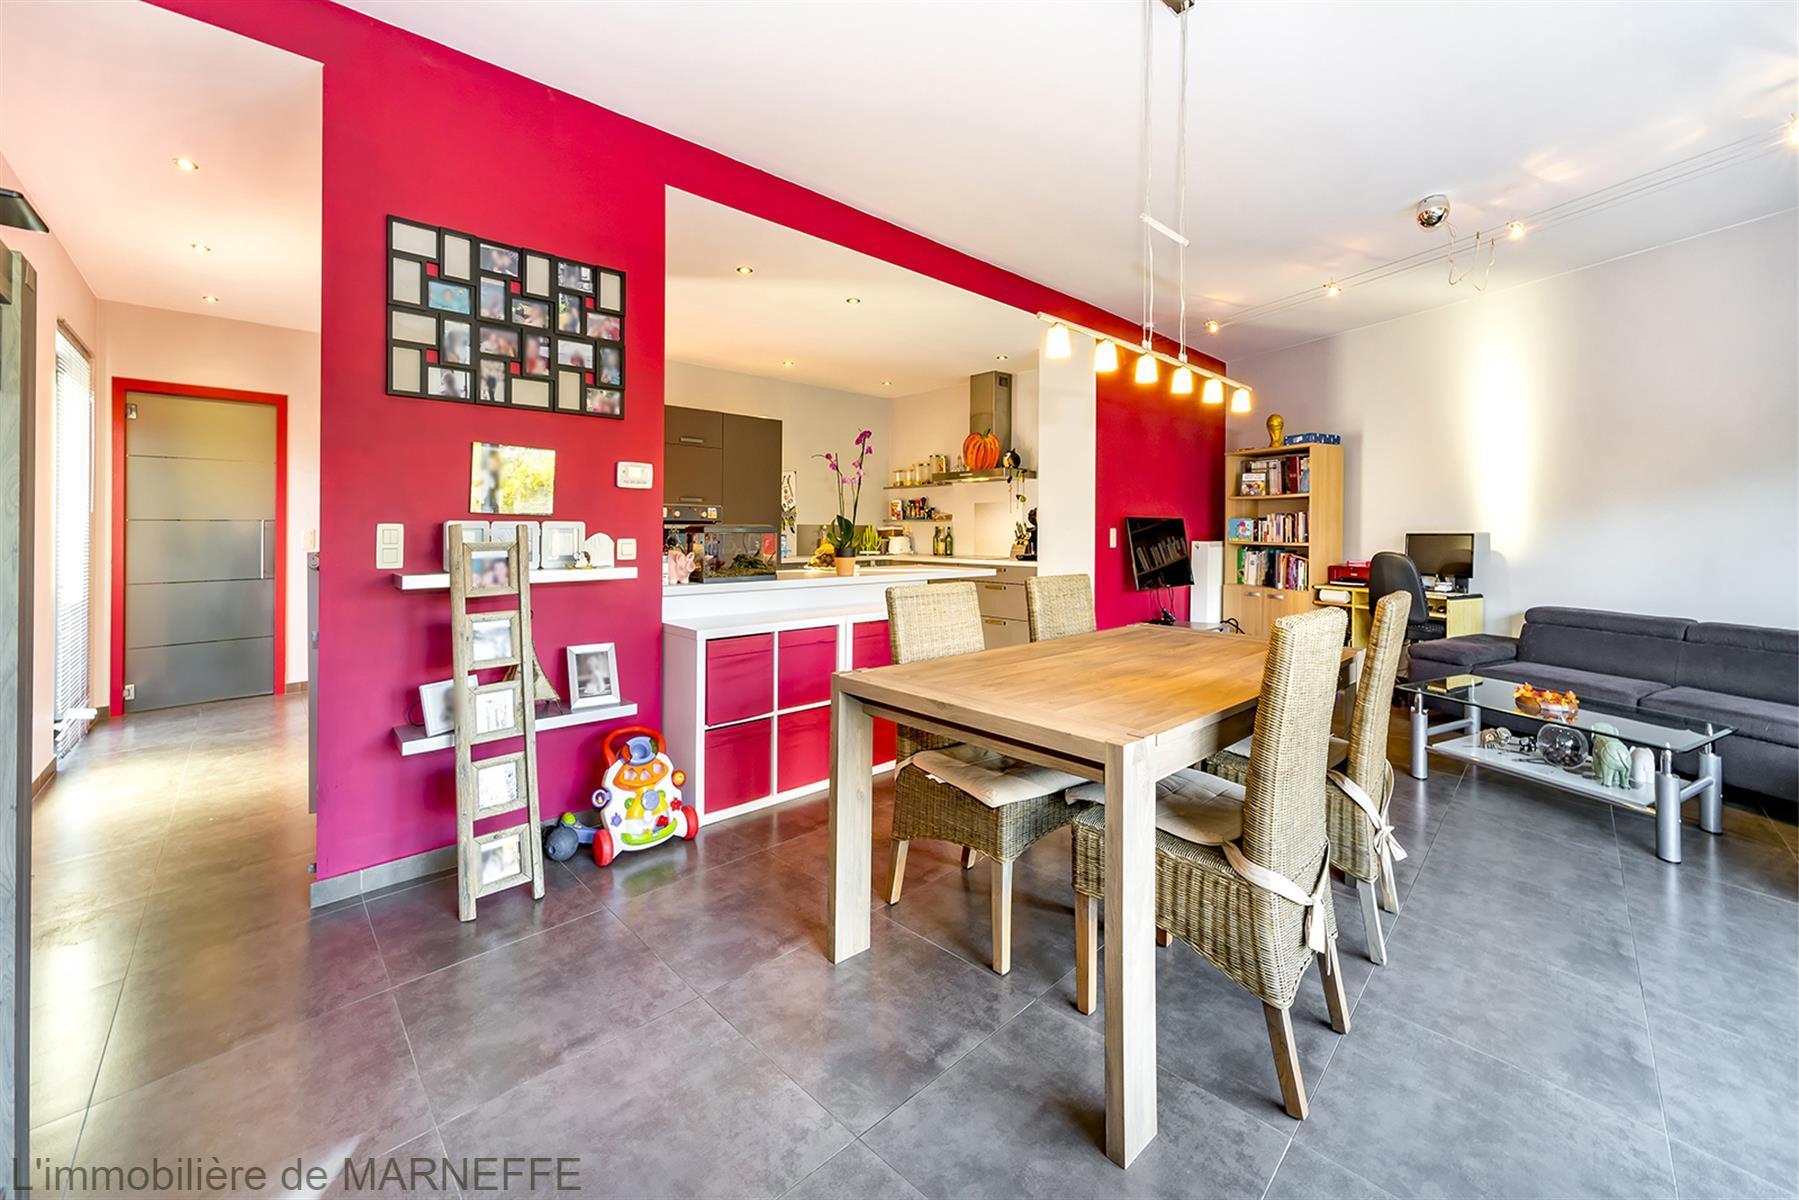 Appartement avec jardin - Orp-Jauche - #3625402-3